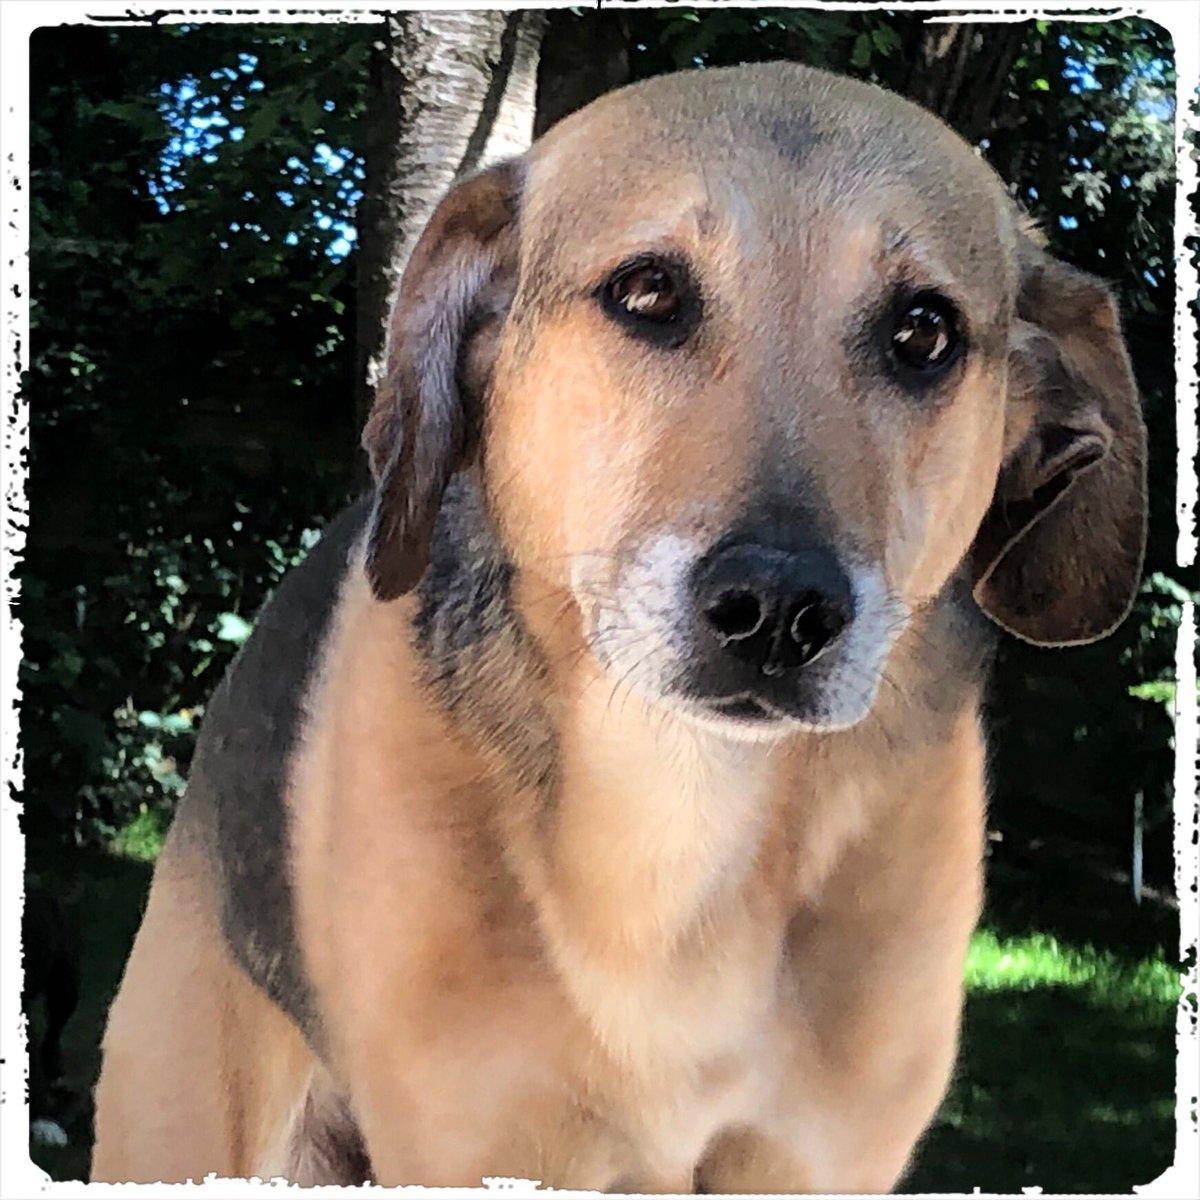 Mika  .  #doglover #ilovemydog #instadog  #meinhund #dogs_of_world #dogsearth #puppies #hund #hundeliebe #hundeleben #dog  #dogislove #trustrespectlove #hundeland #hundeblog #lieblingshund #lebenmithund #fellnase  #besterhund #dogsneeddogs #doggy #dogs #hundefreundschaftpic.twitter.com/AY6Whzh1zn